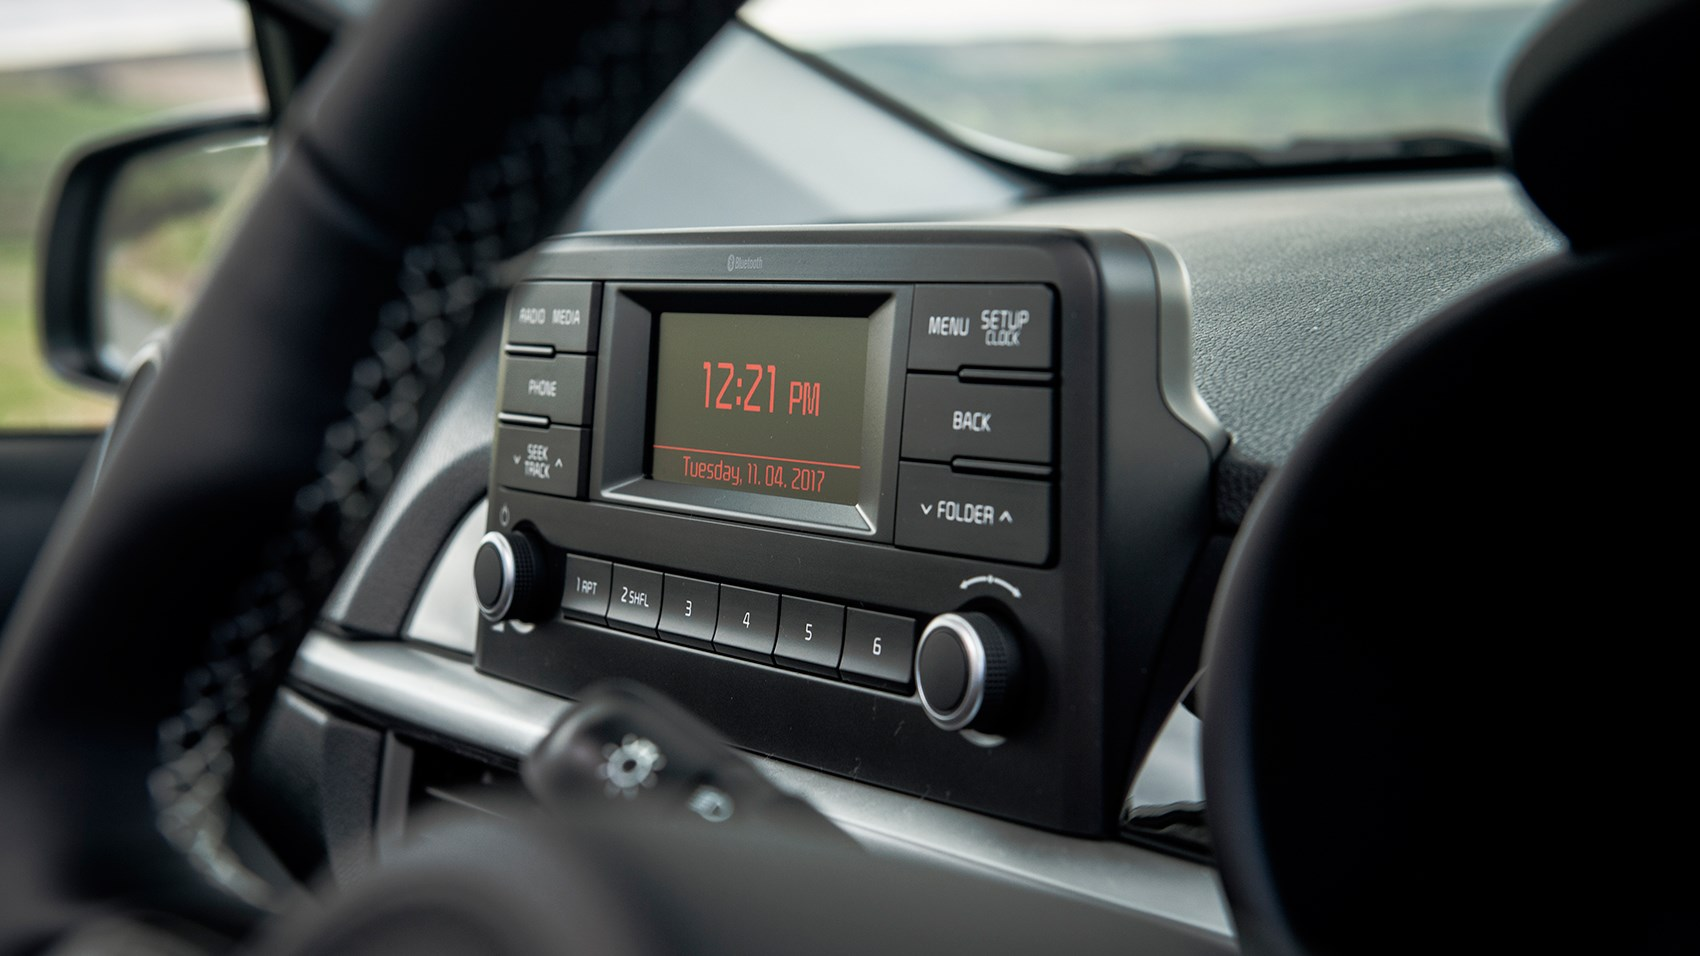 kia picanto 1.0 2 (2017) review | car magazine